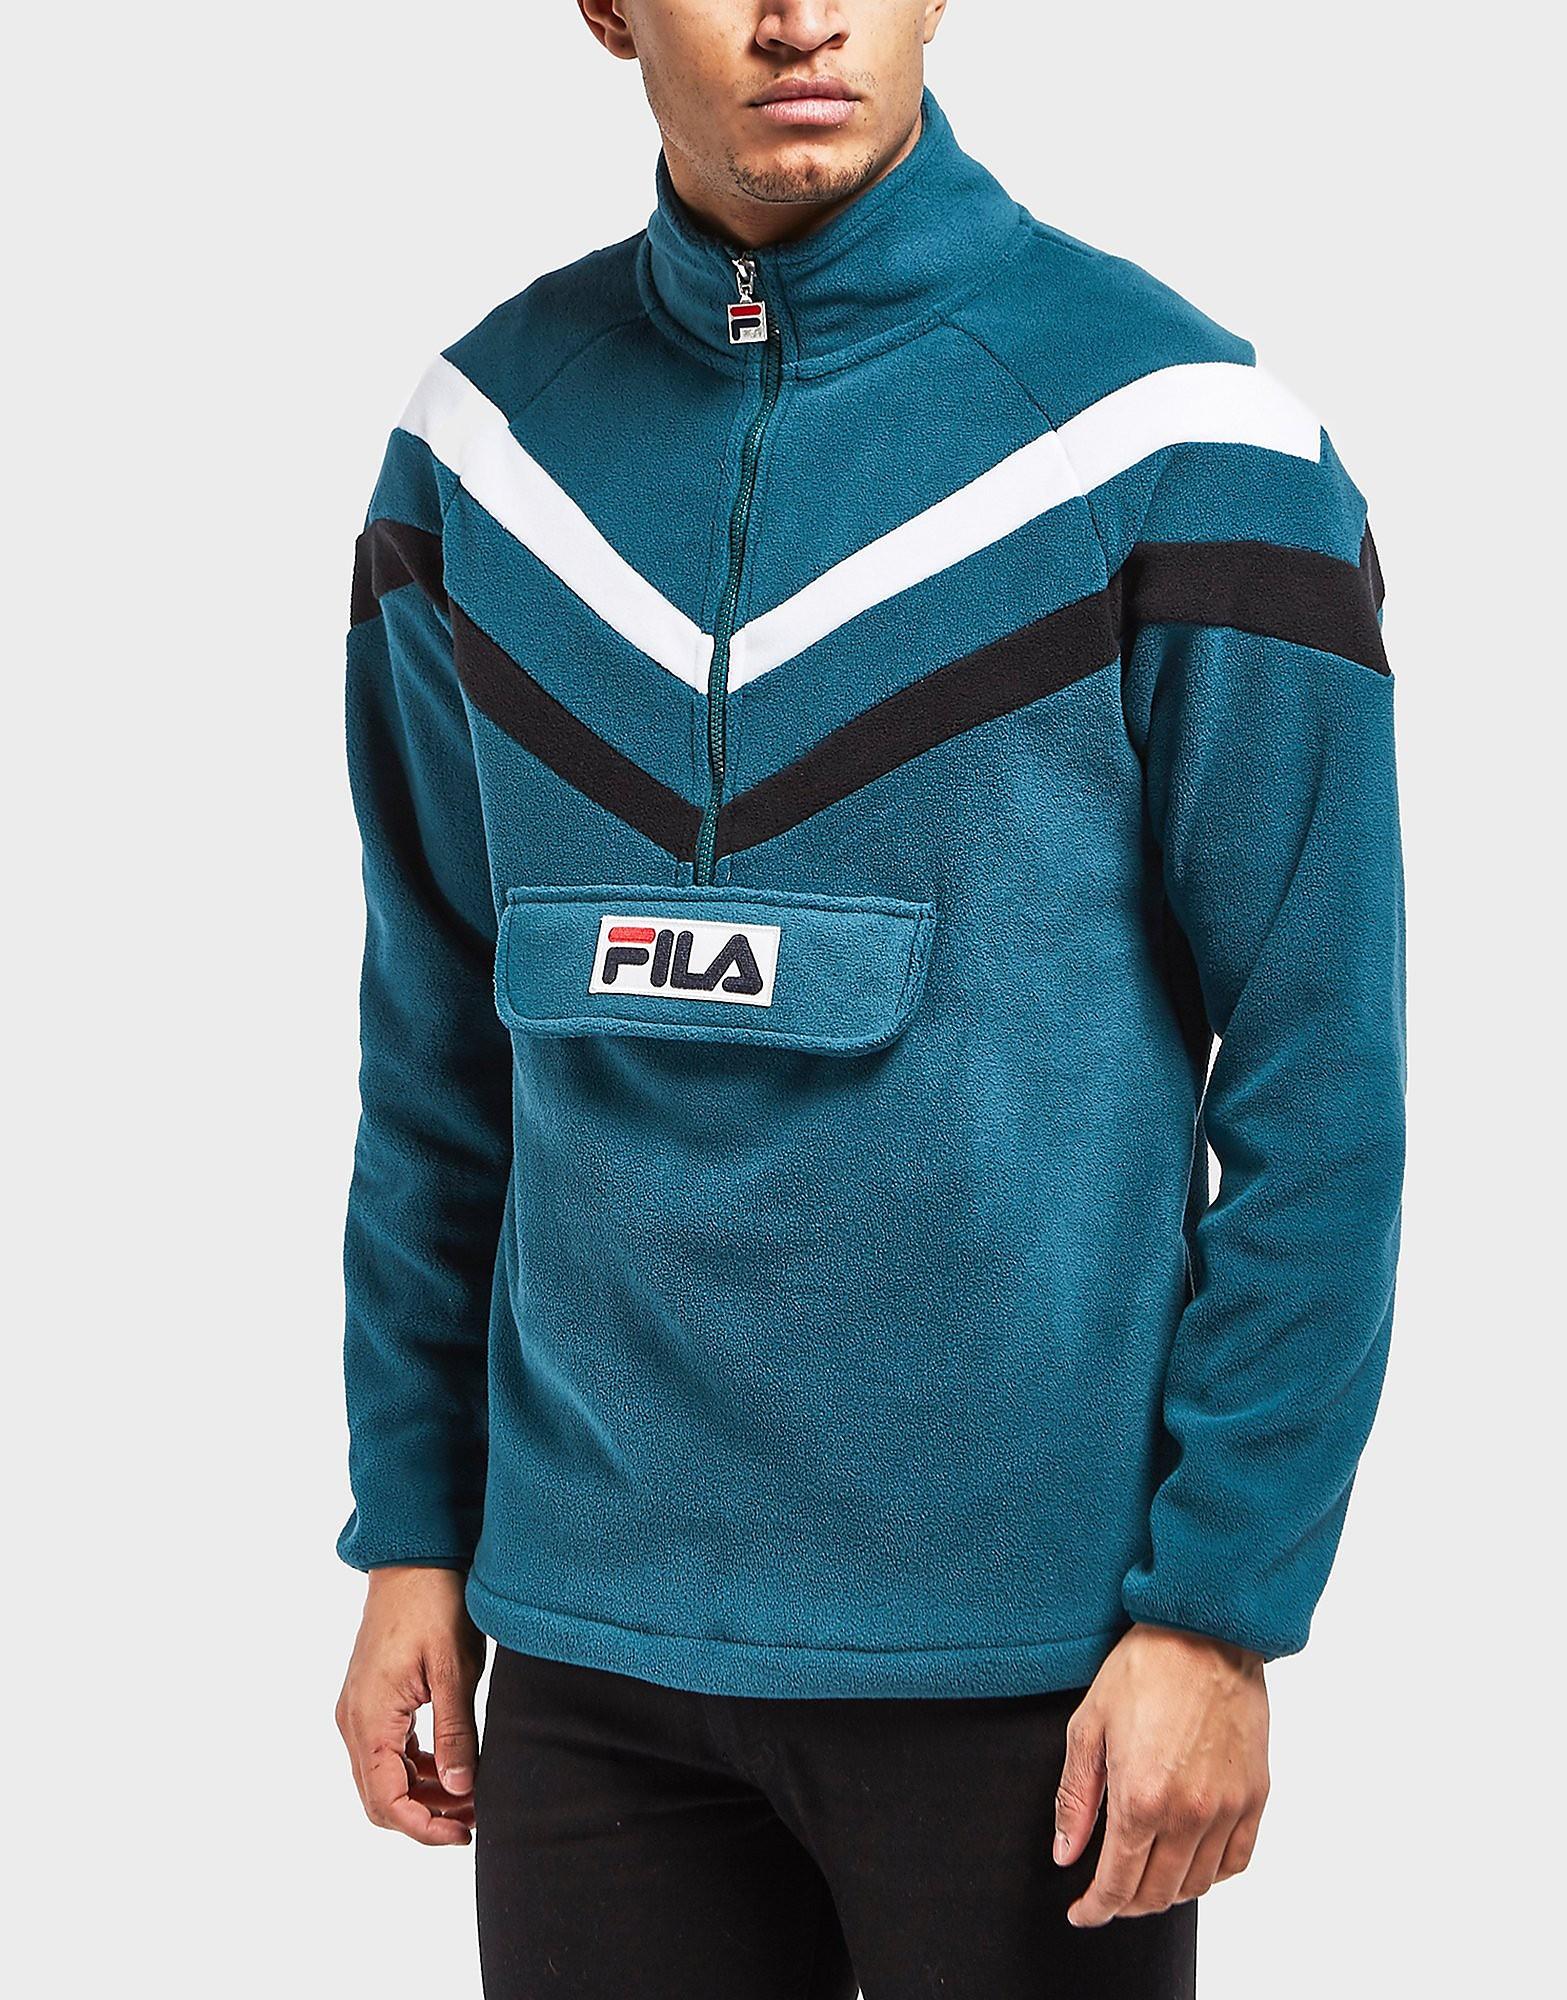 Fila Val Veny Half Zip Sweatshirt